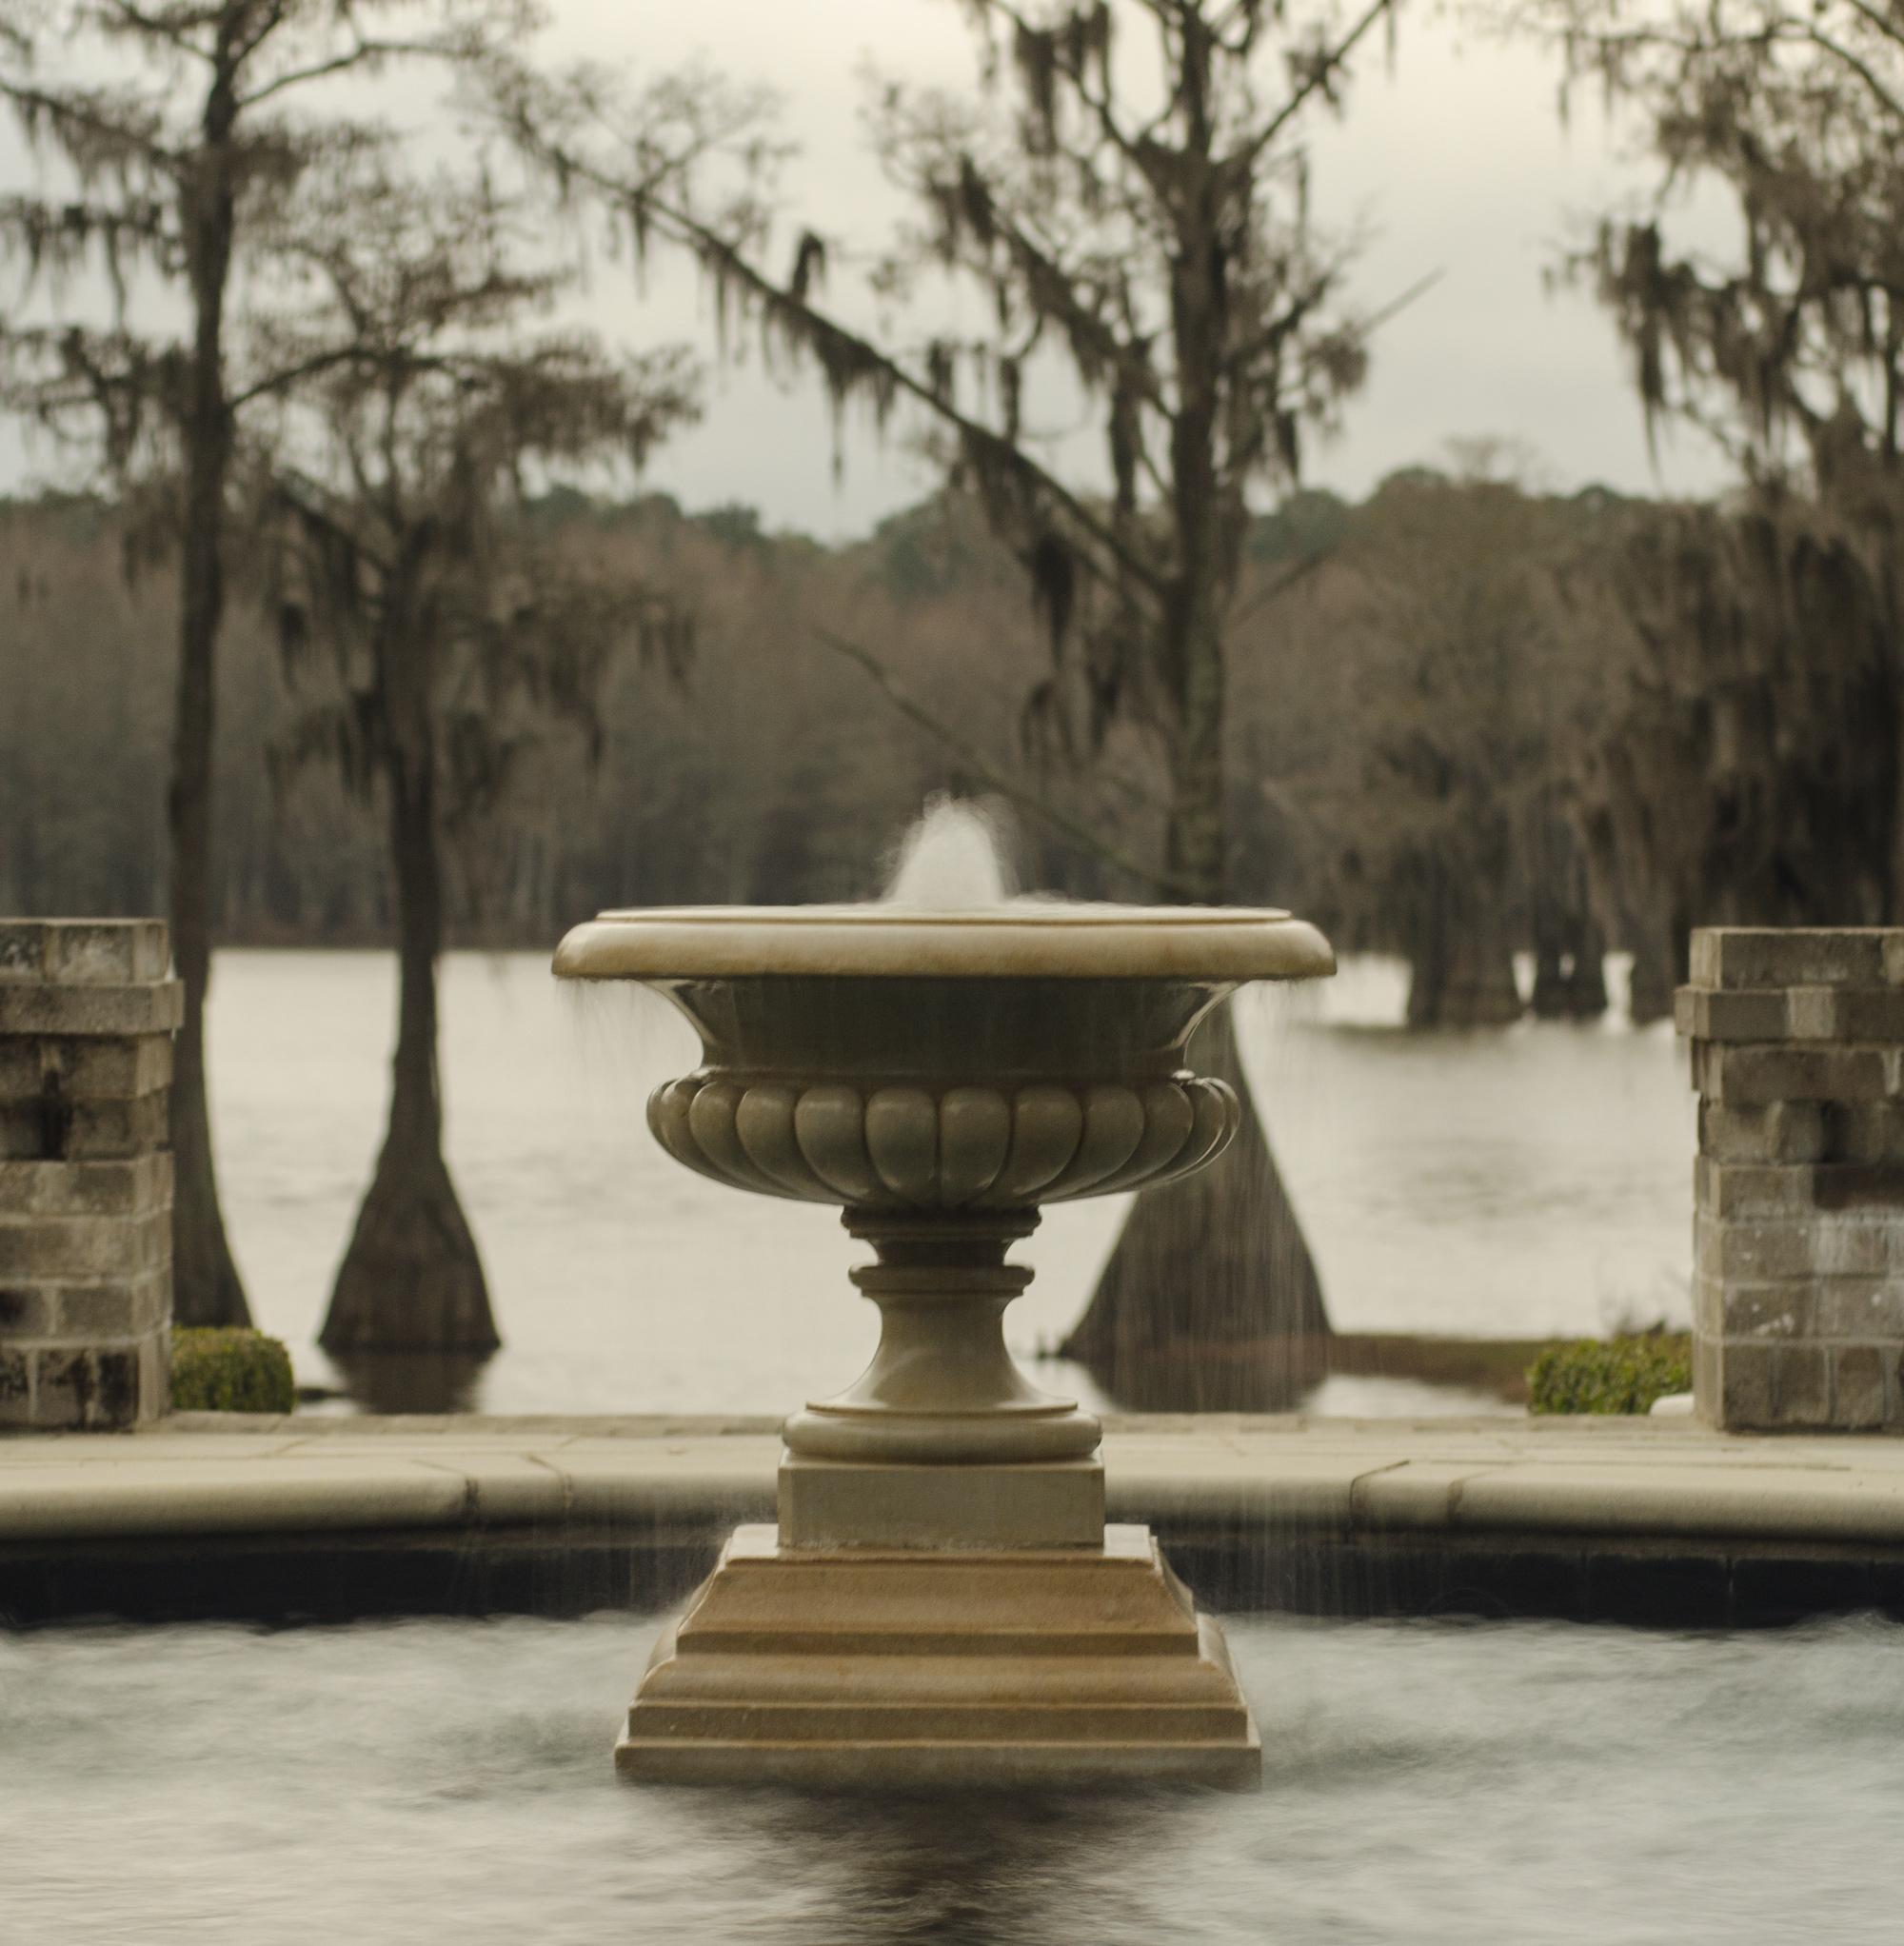 lake-douglas-fountain.jpg